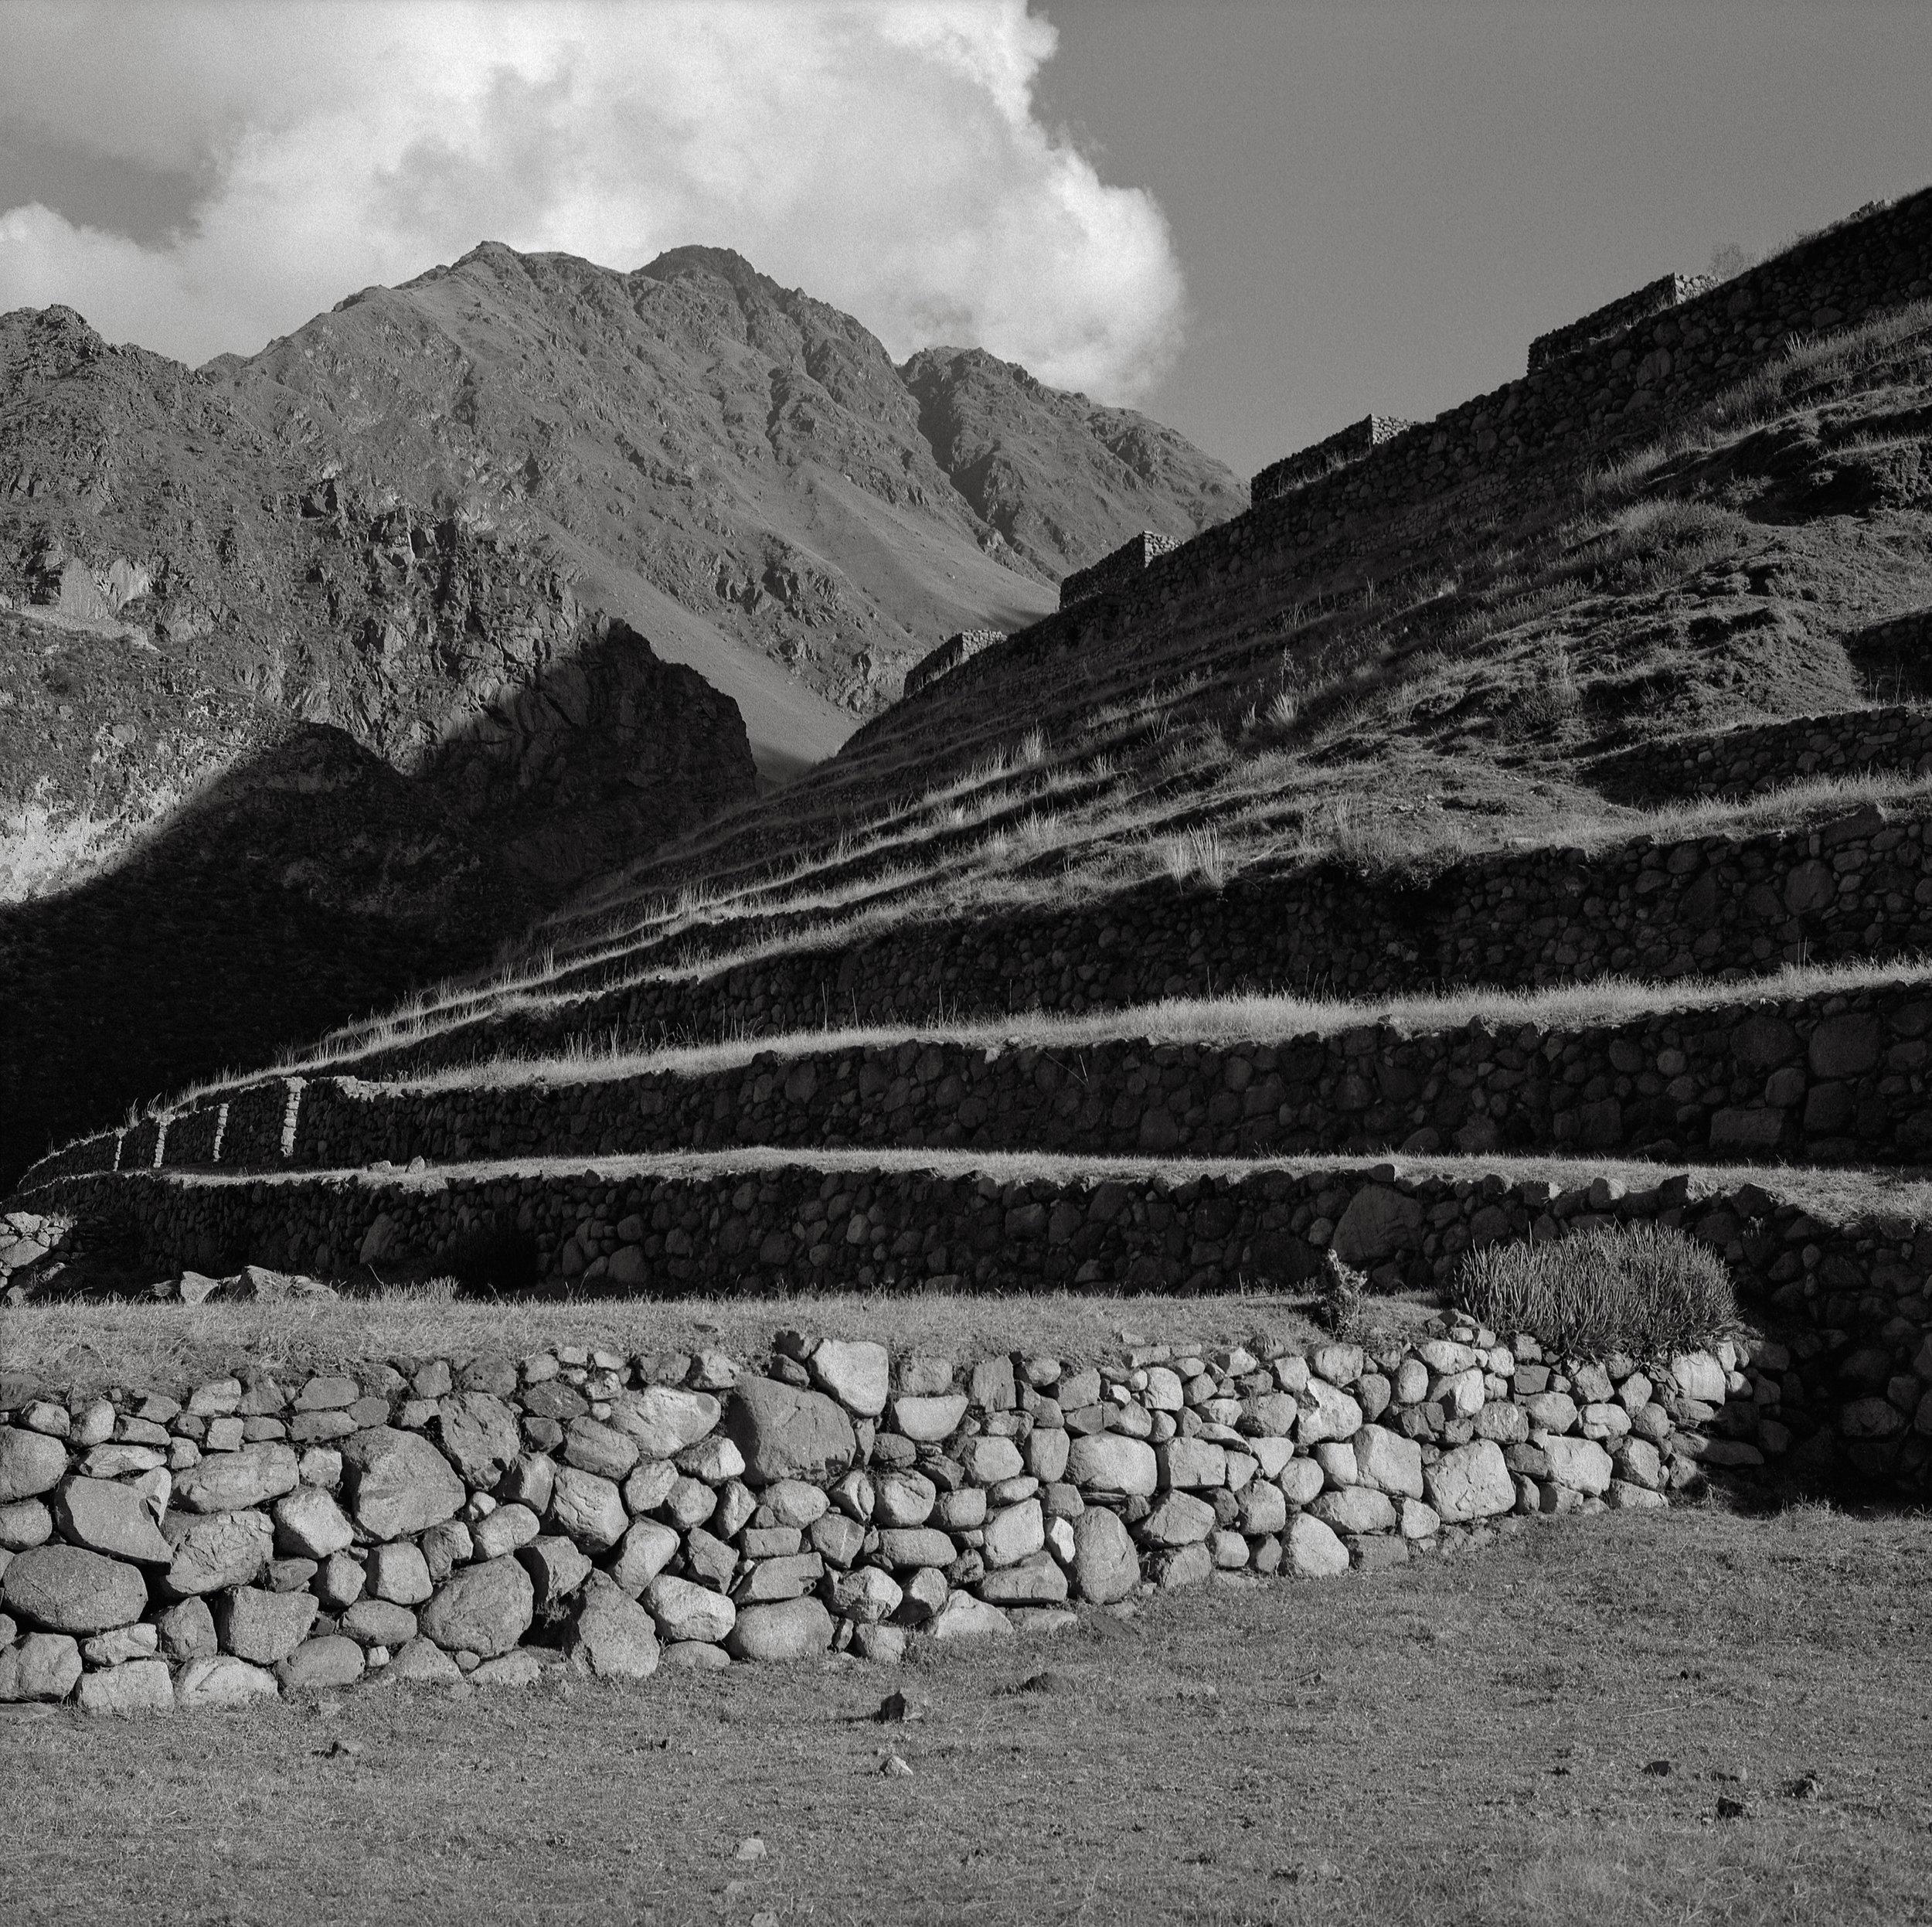 Patallacta, Peru